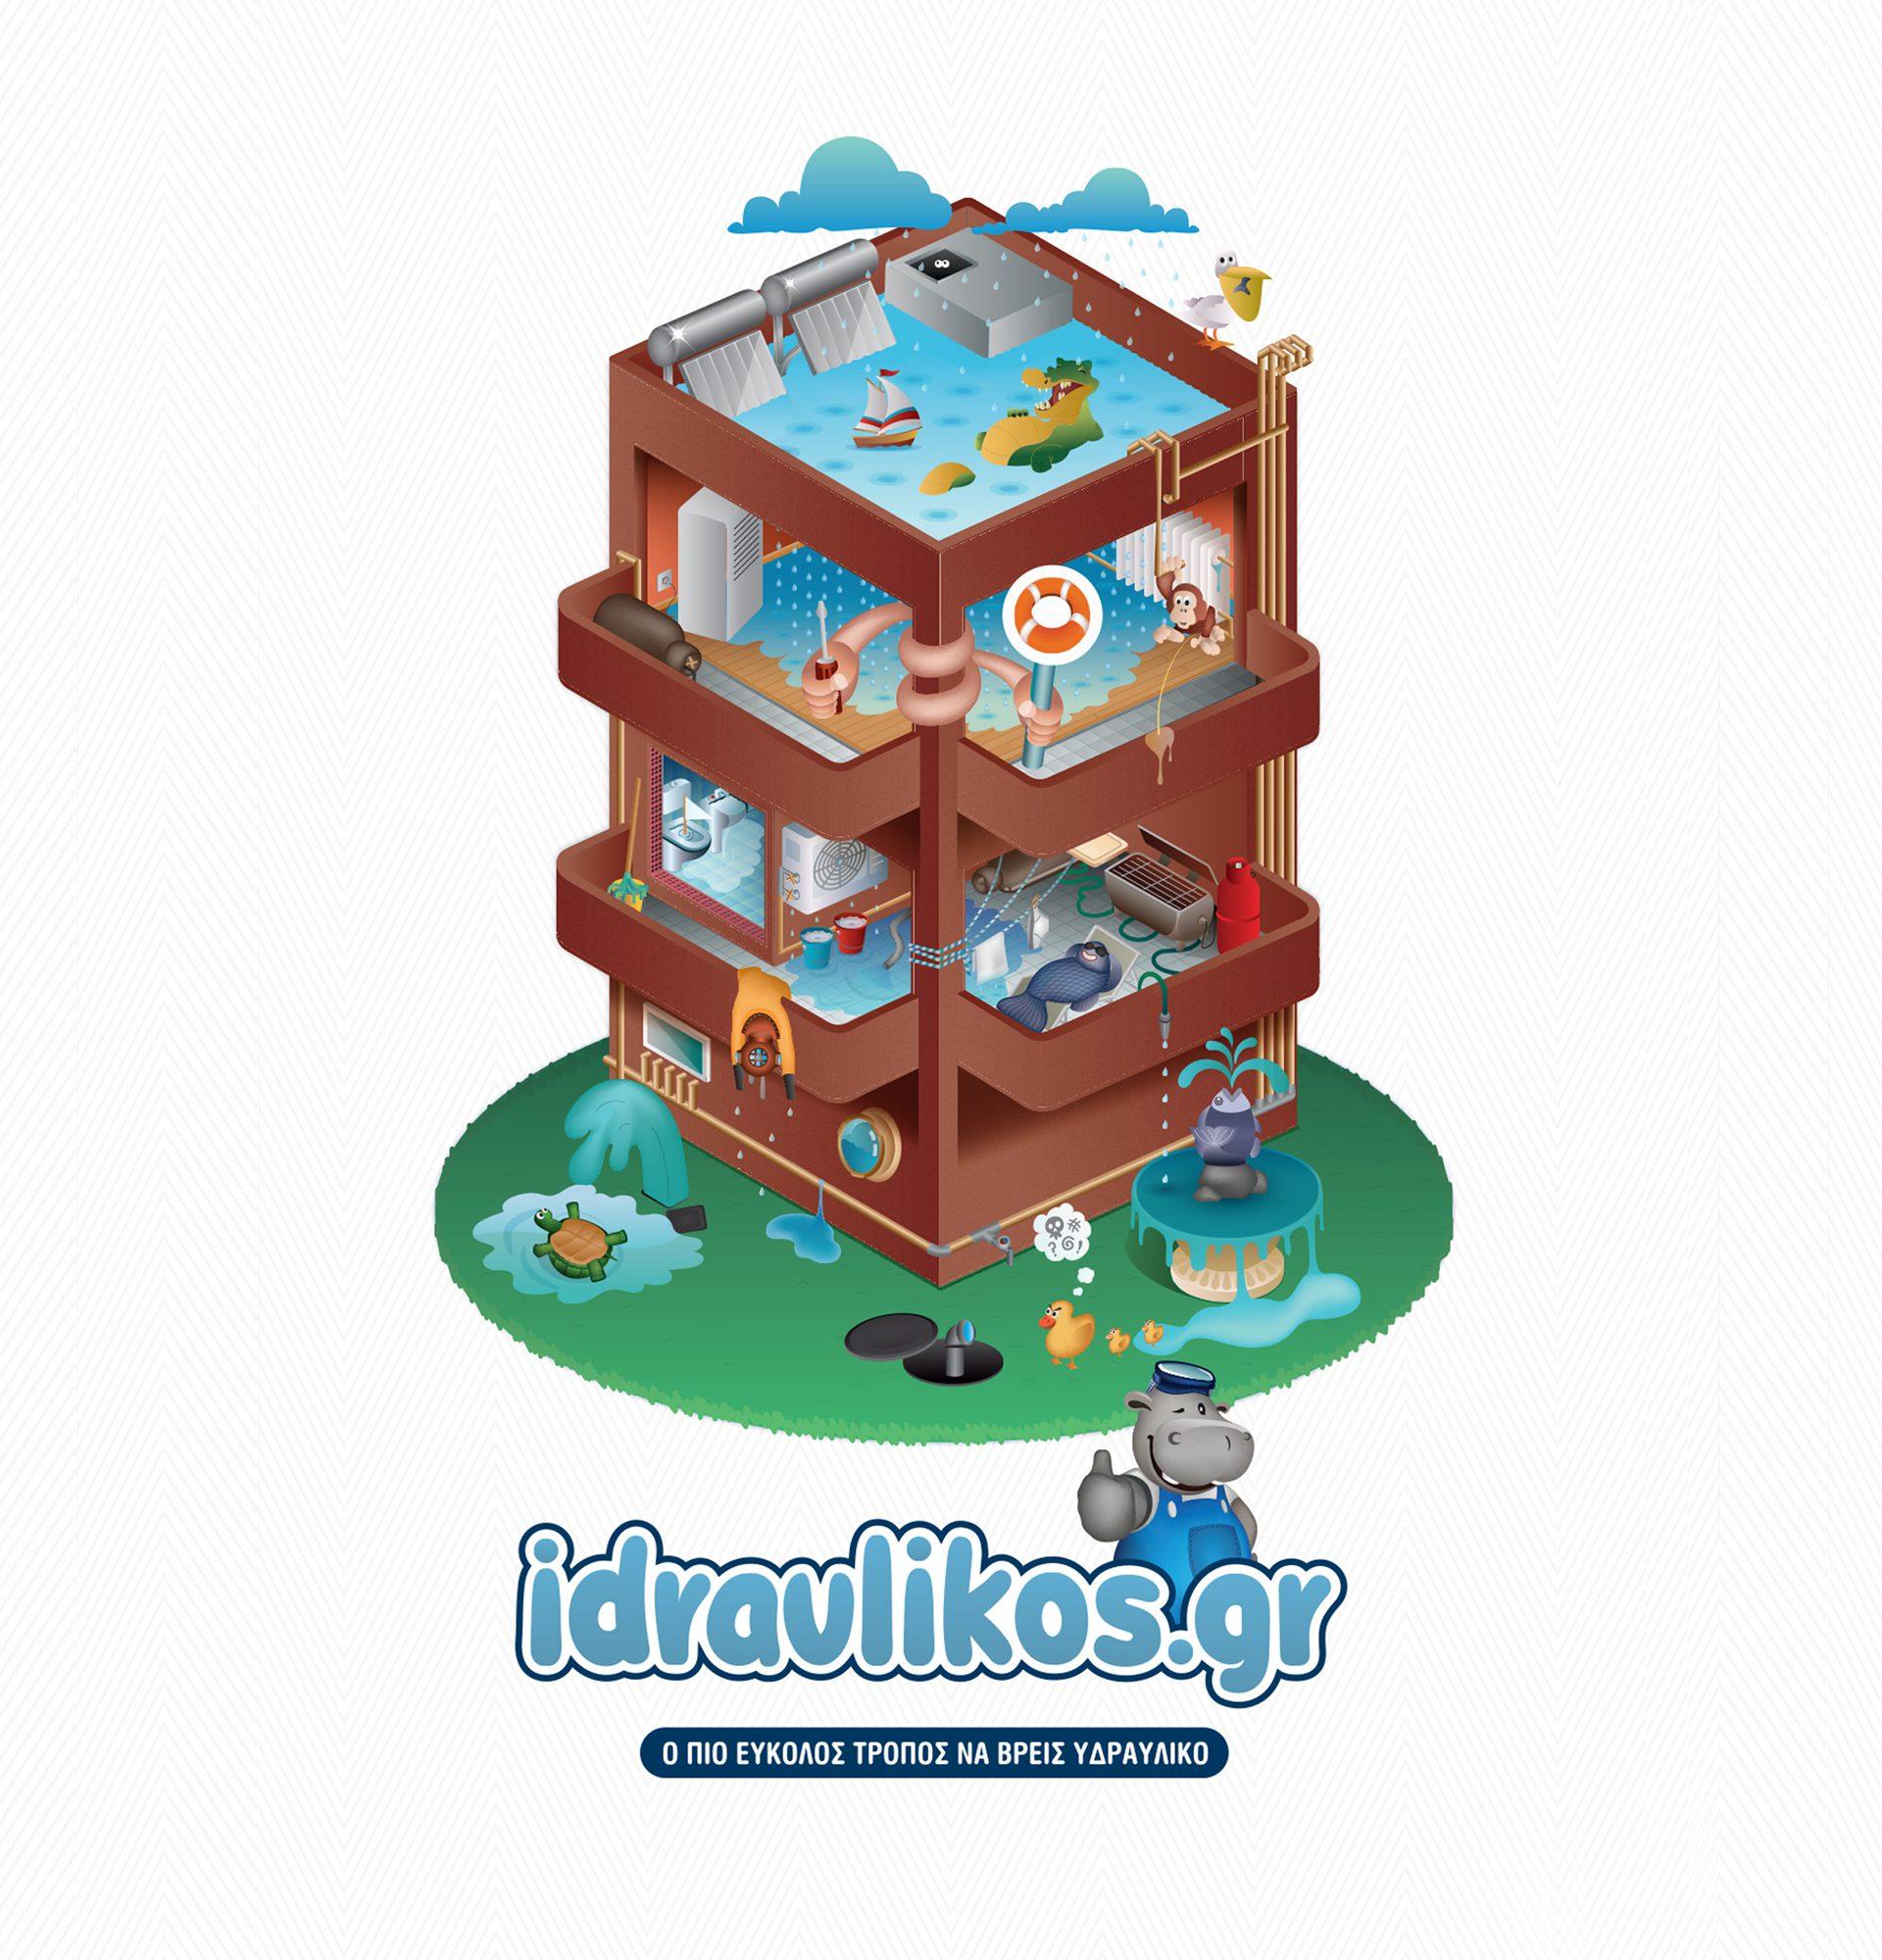 designpark_idravlikos_website